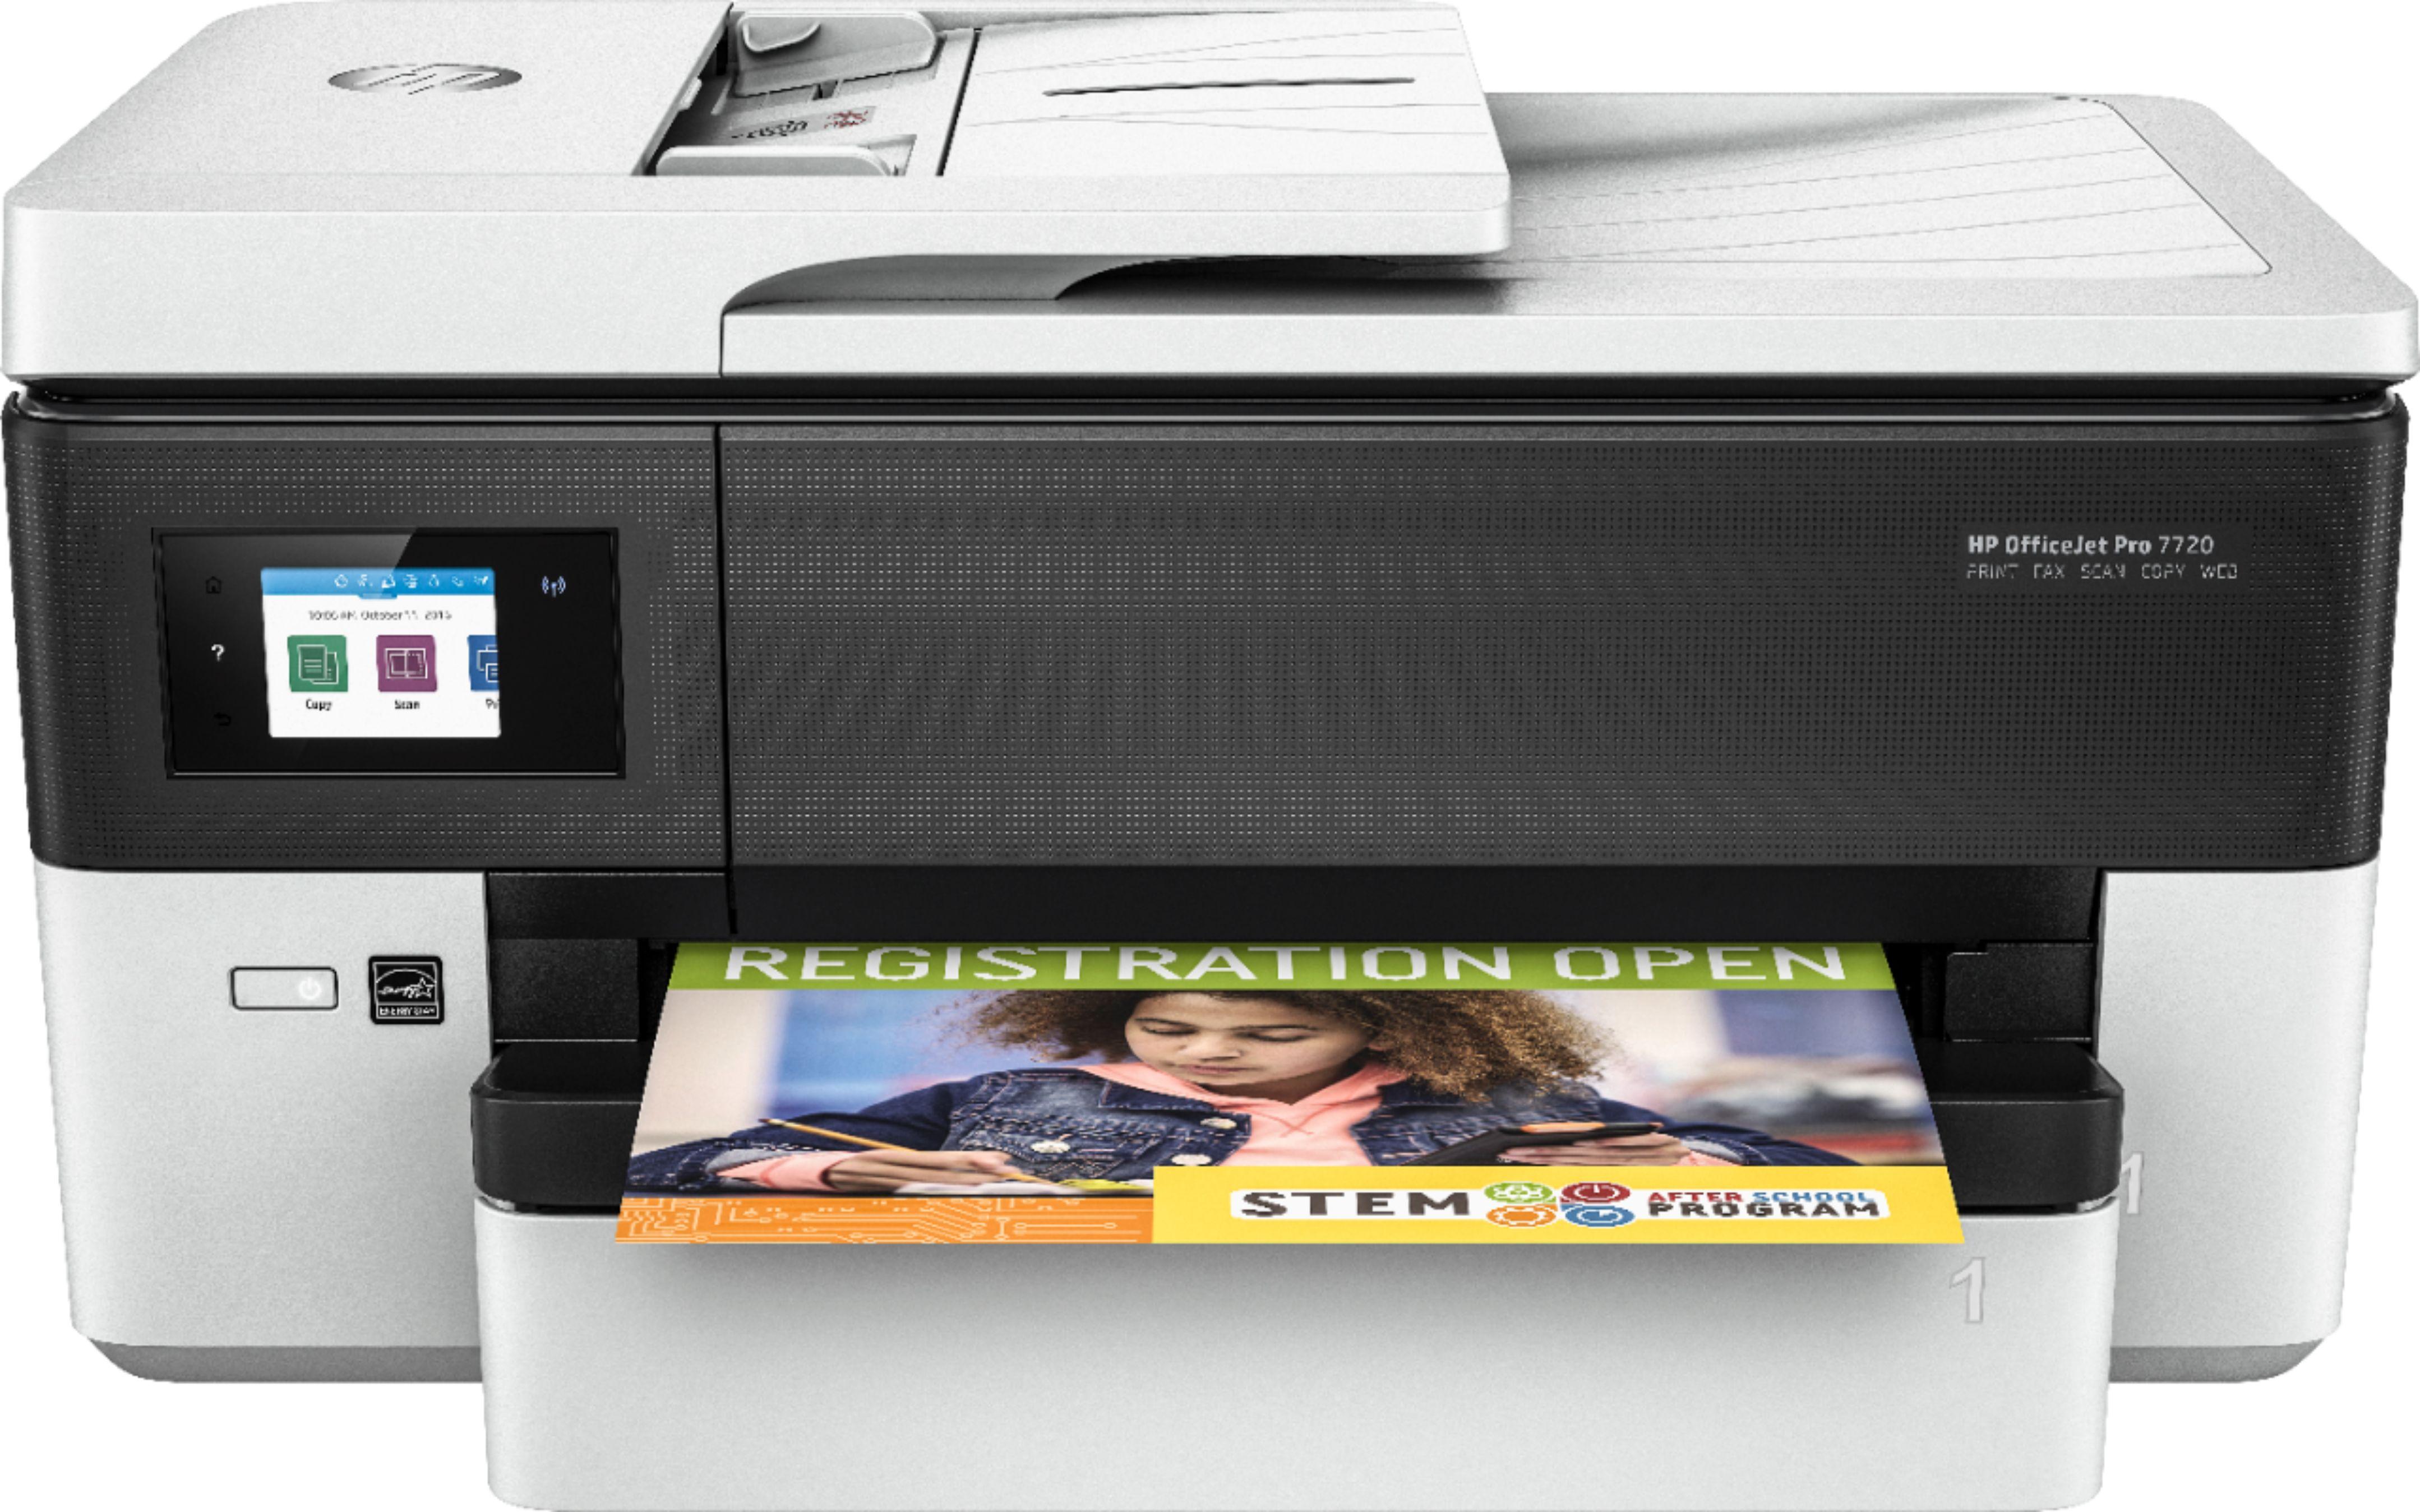 Calm Hp Officejet Pro Wireless Printer Large Inkjet Printers Buy Canon Pixma Pro 100 Driver Download Canon Pro 100 Xps Driver dpreview Canon Pro 100 Driver